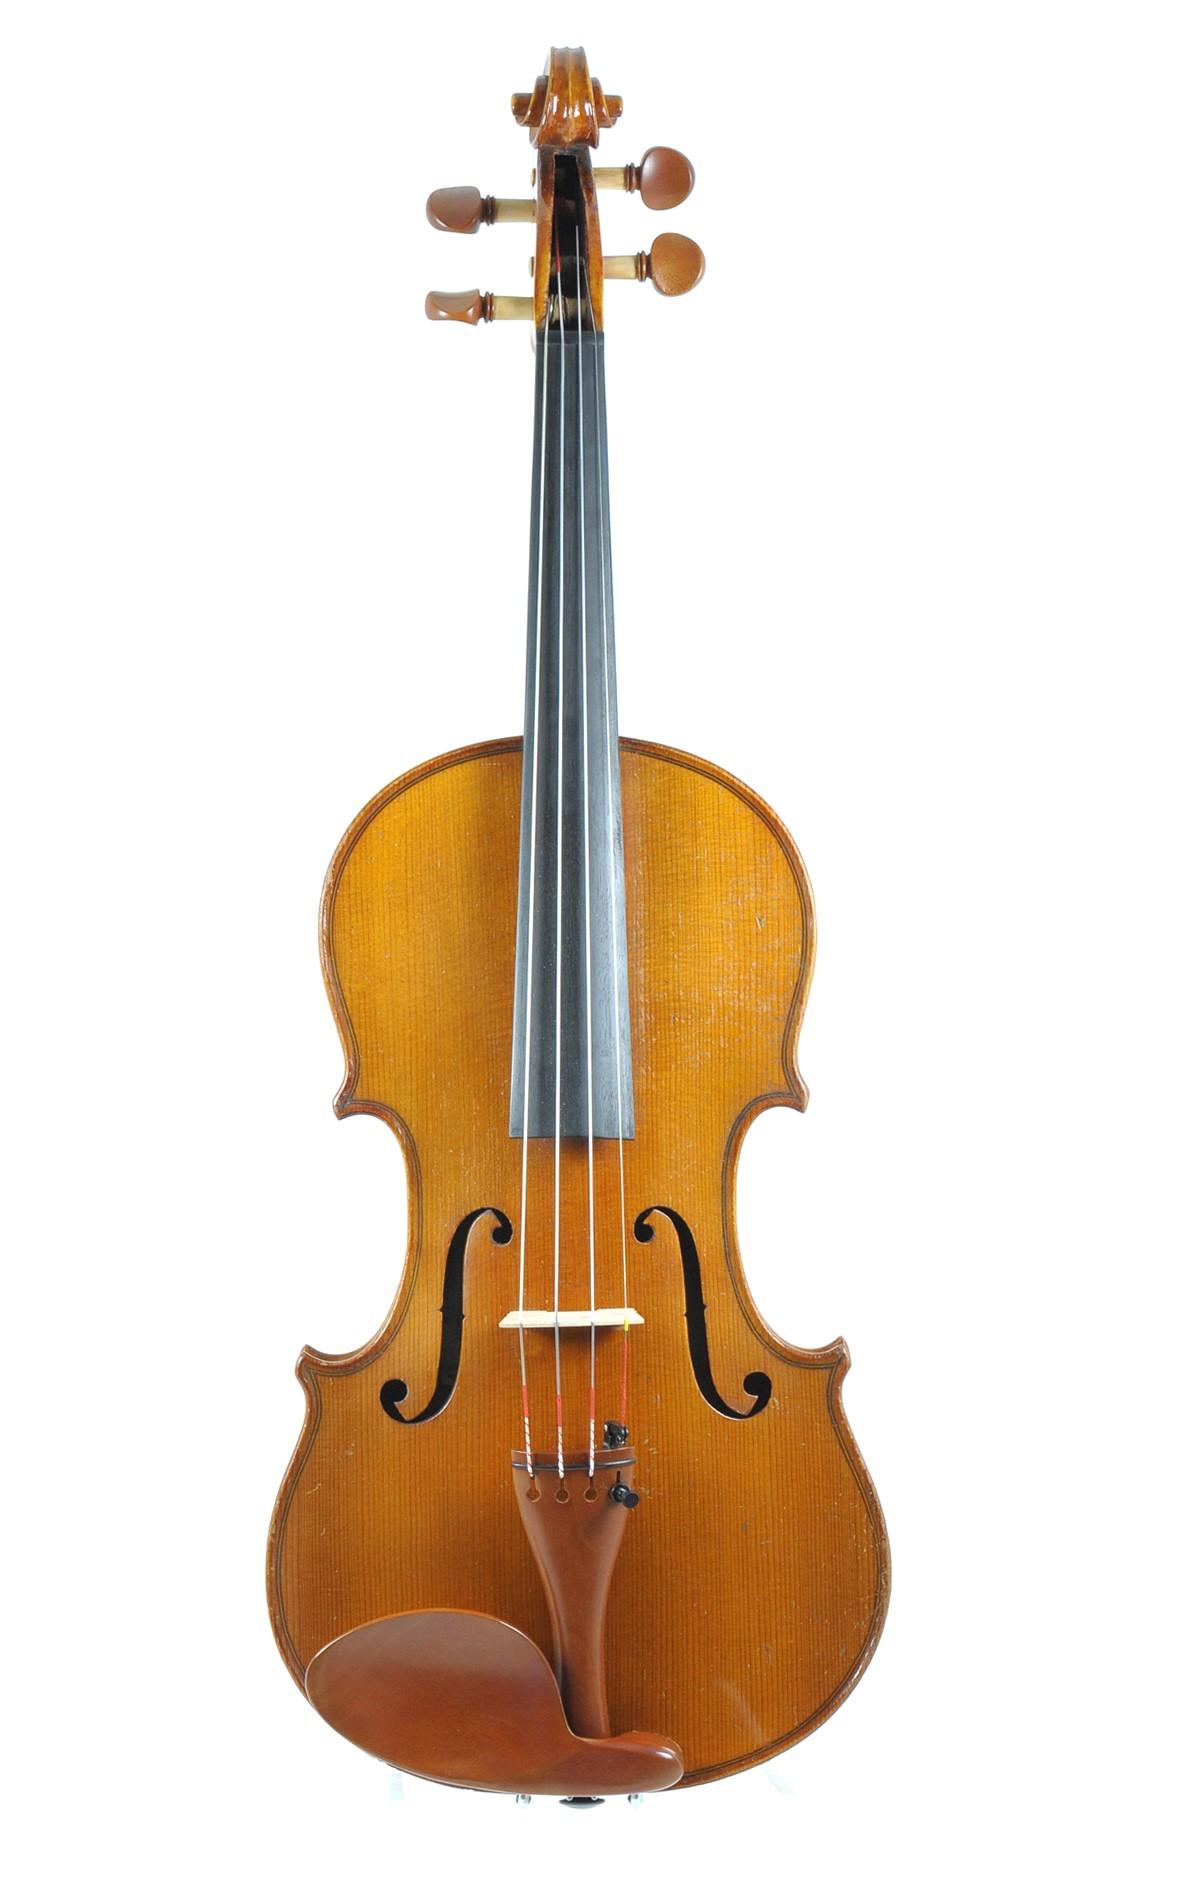 Karl Lehmpfuhl, violin ca. 1900 - top